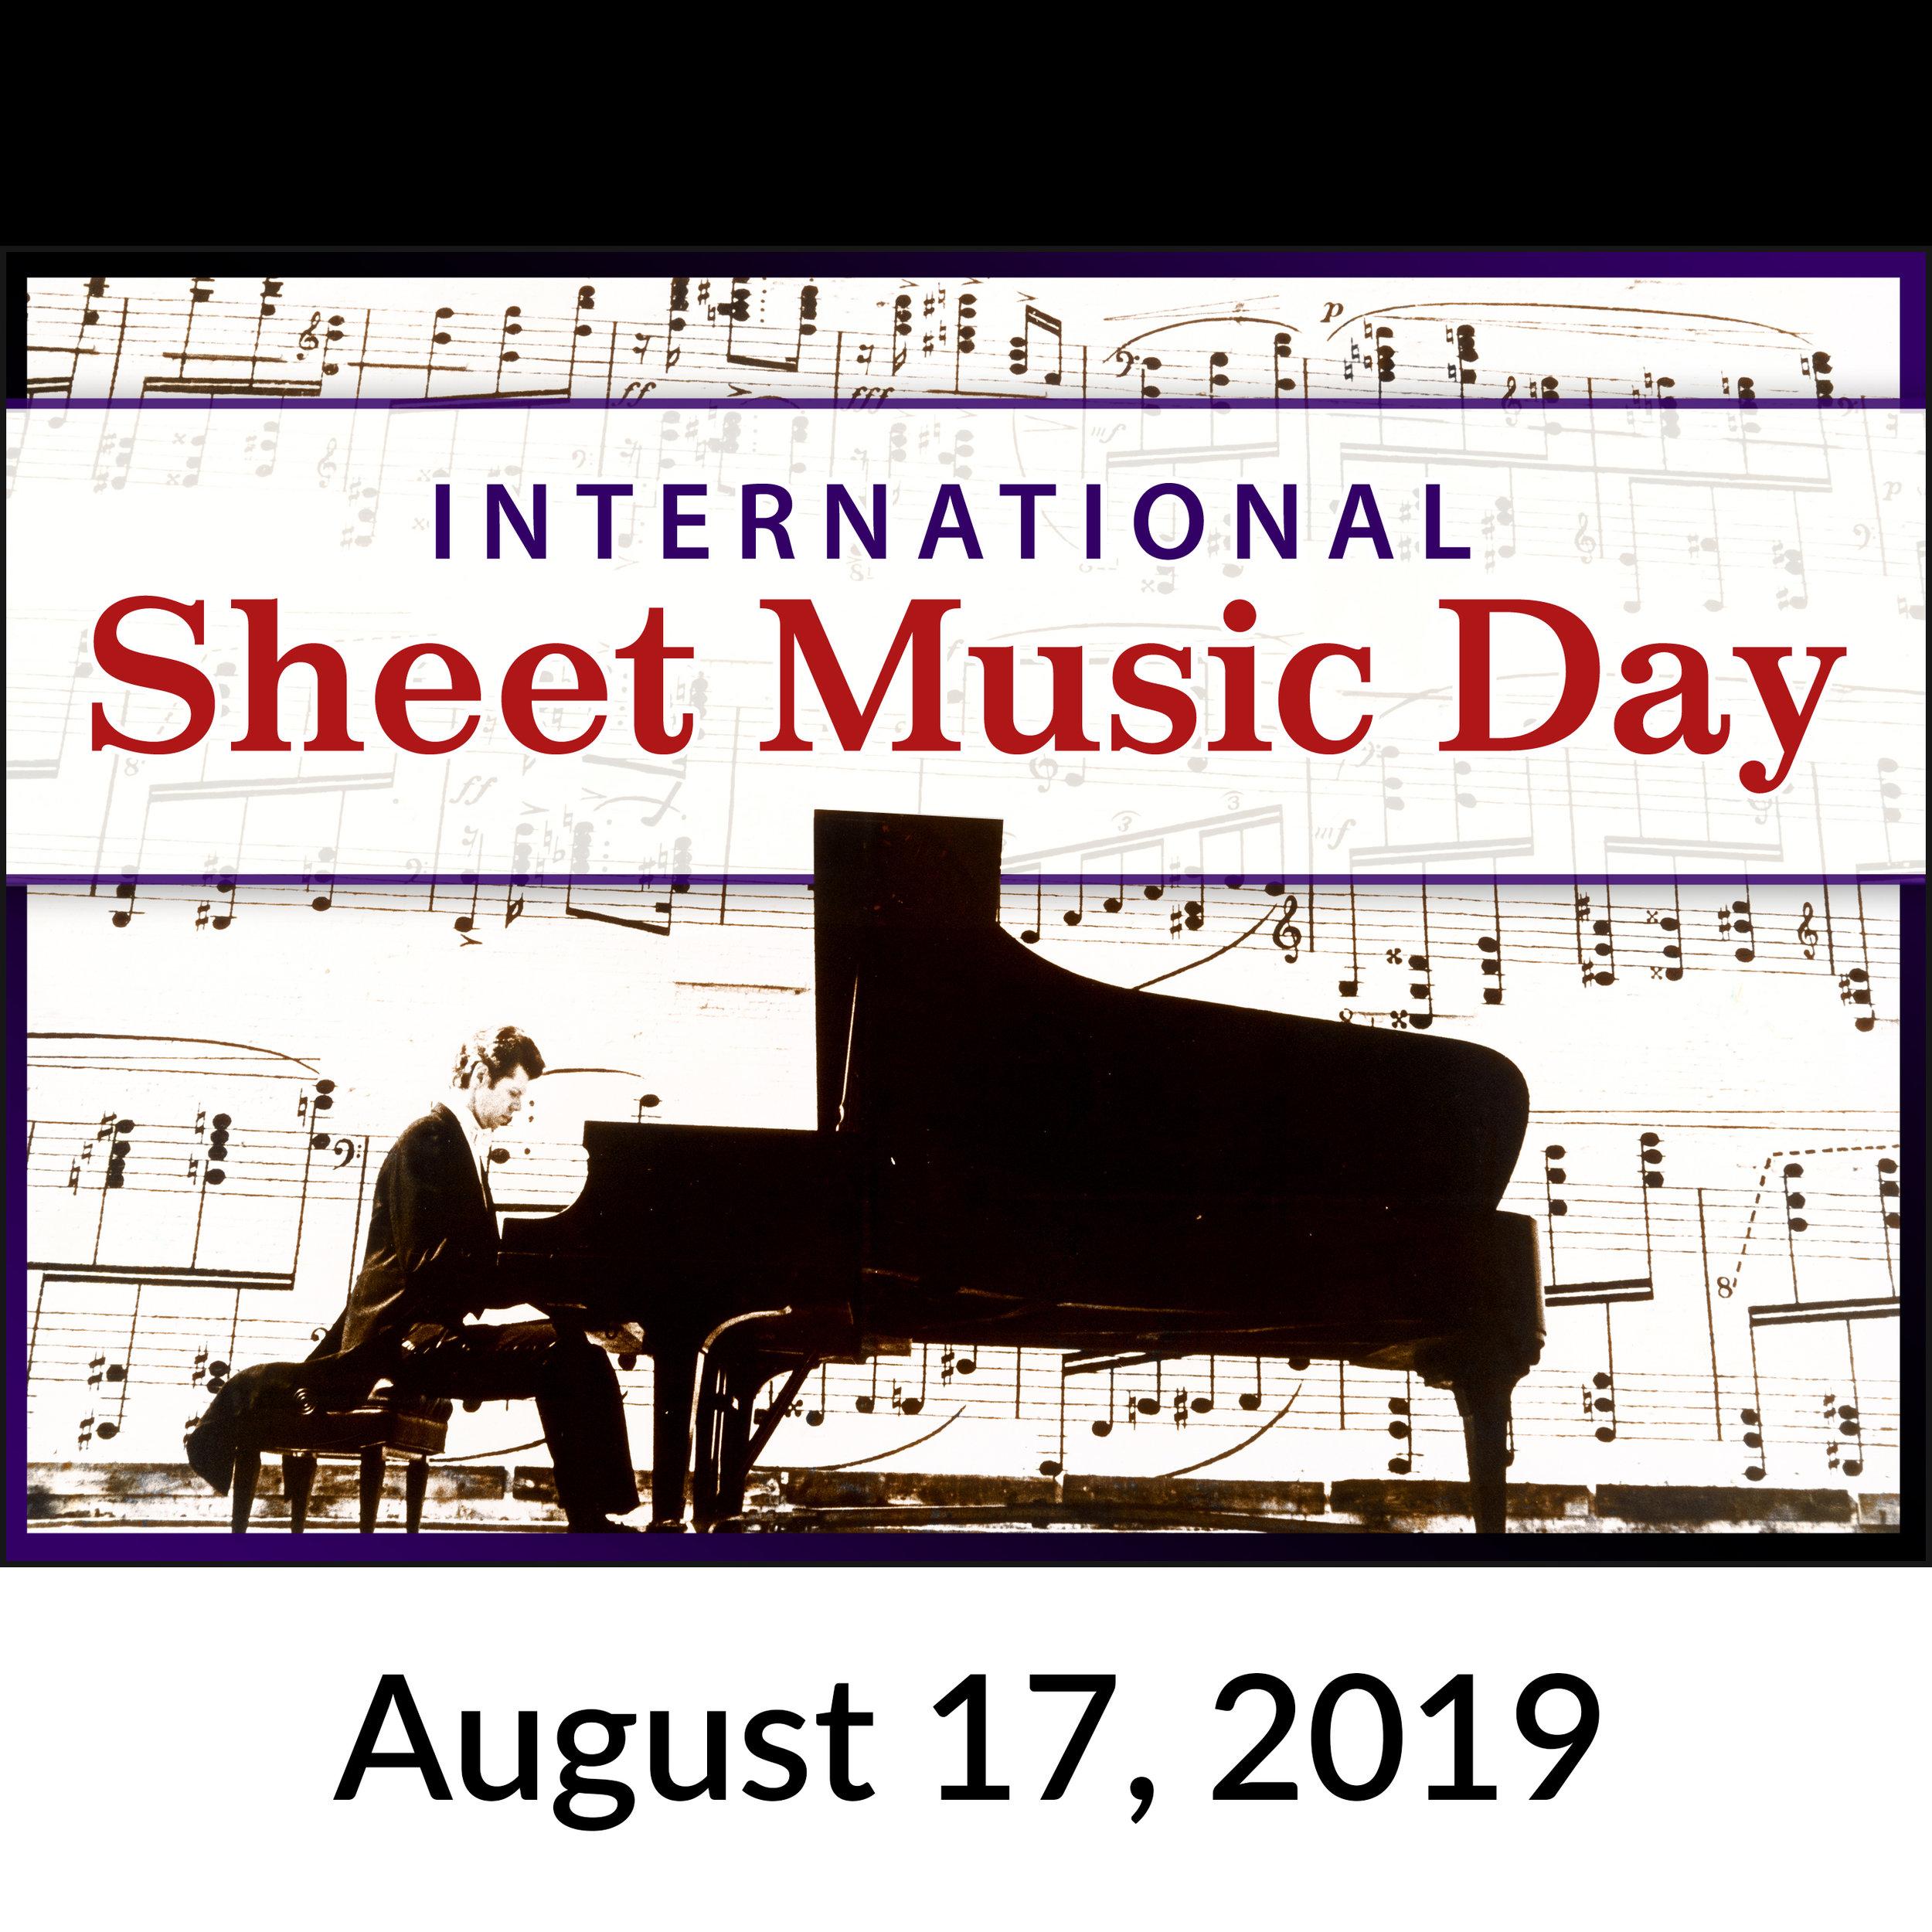 International Sheet Music Day logo #internationalsheetmusicday